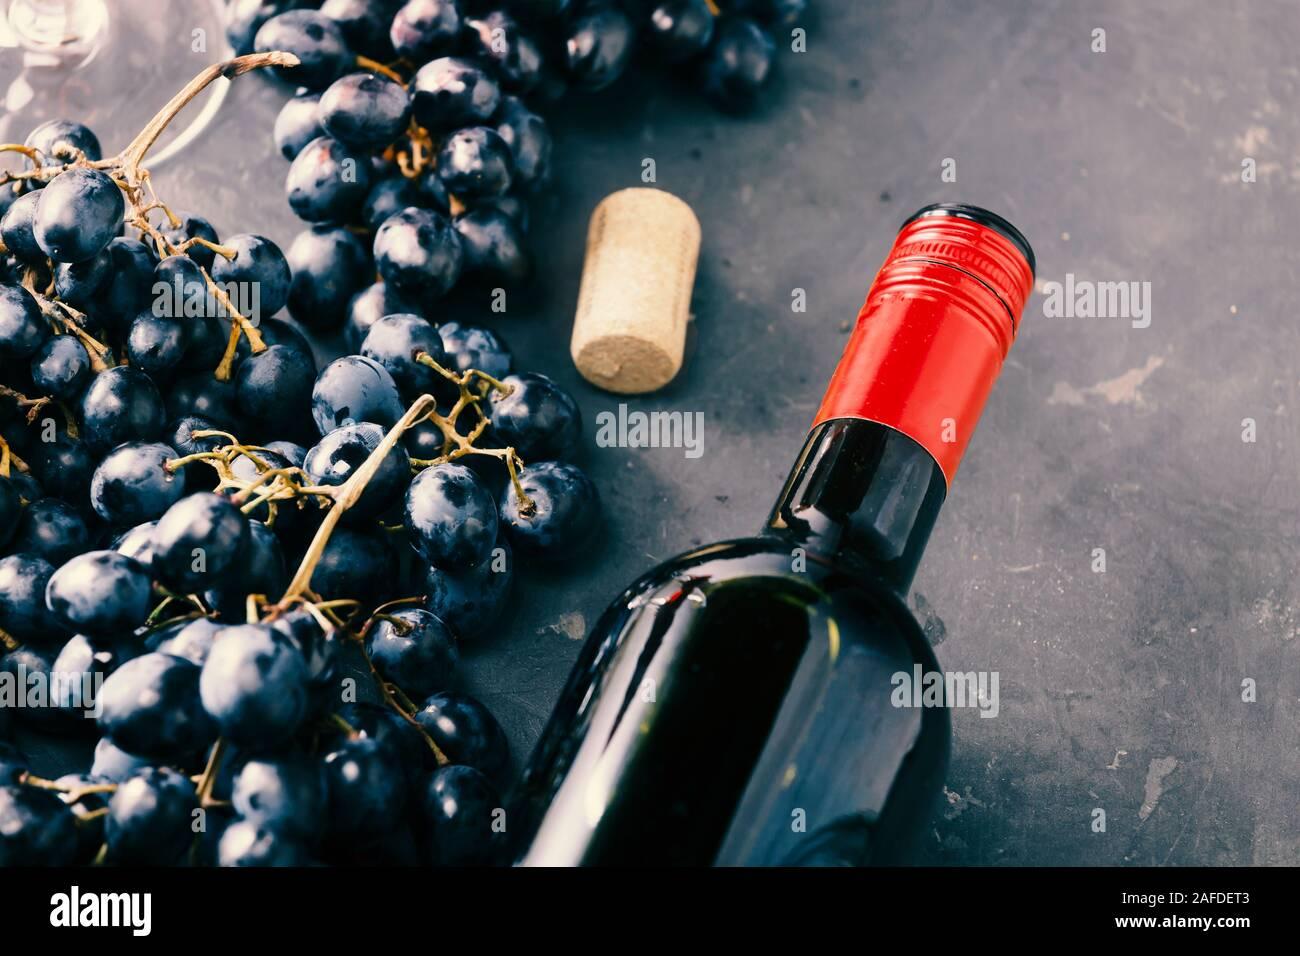 chardonnay, pinot noir, rosato, pinot, blume verdejo, tasting notes, oddero, chardonnay, gift Stock Photo